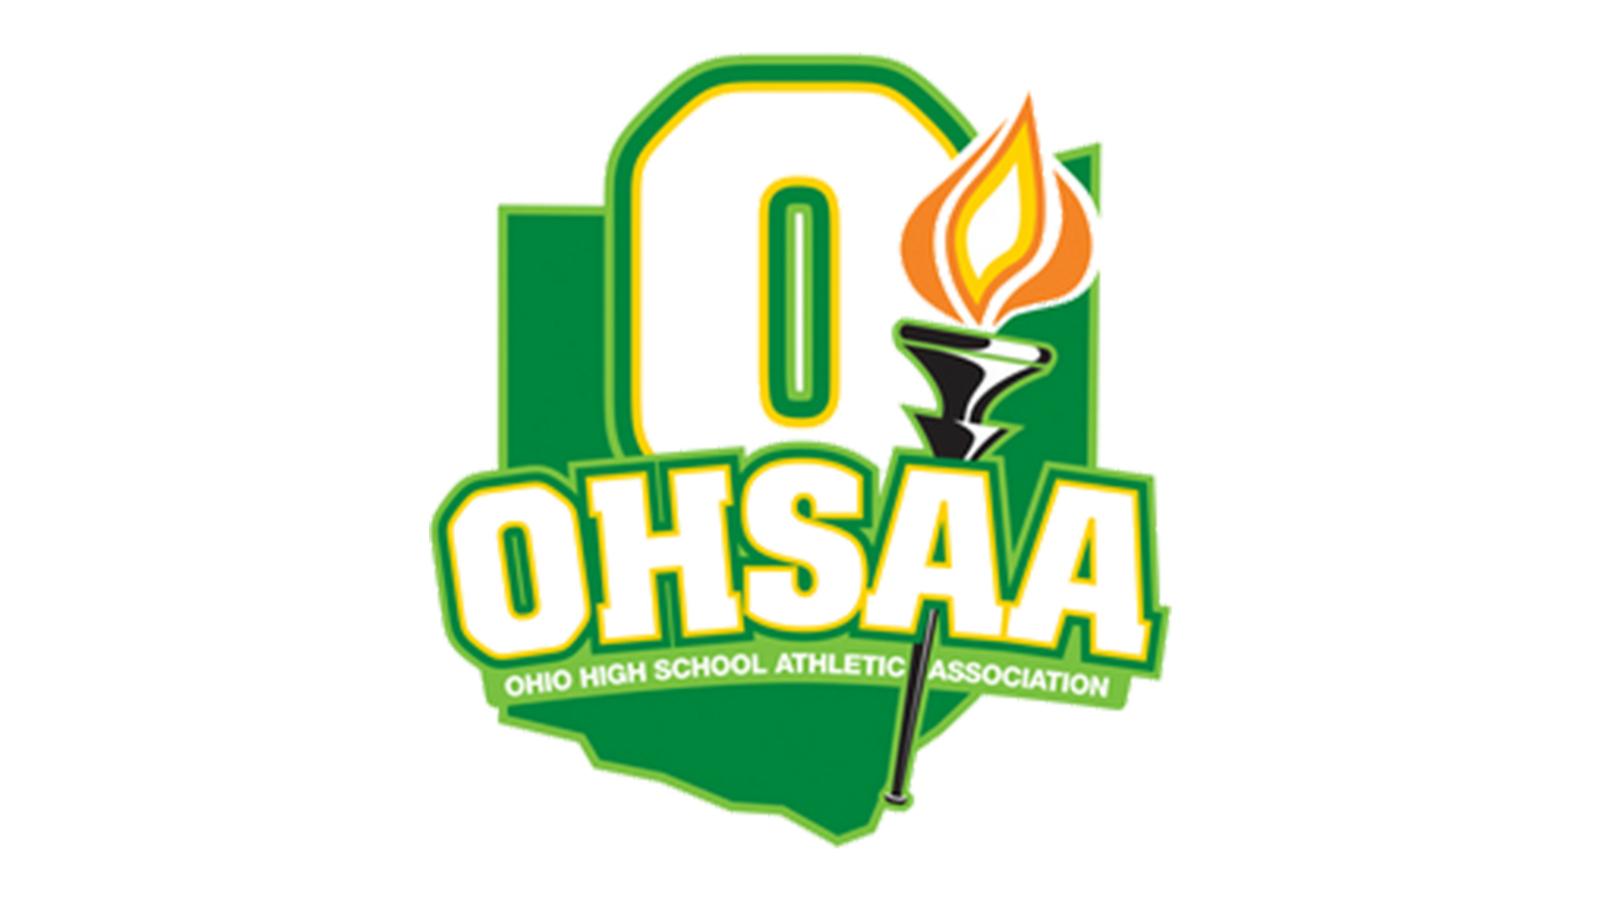 OHSAA 2019 -2020 Physical Form